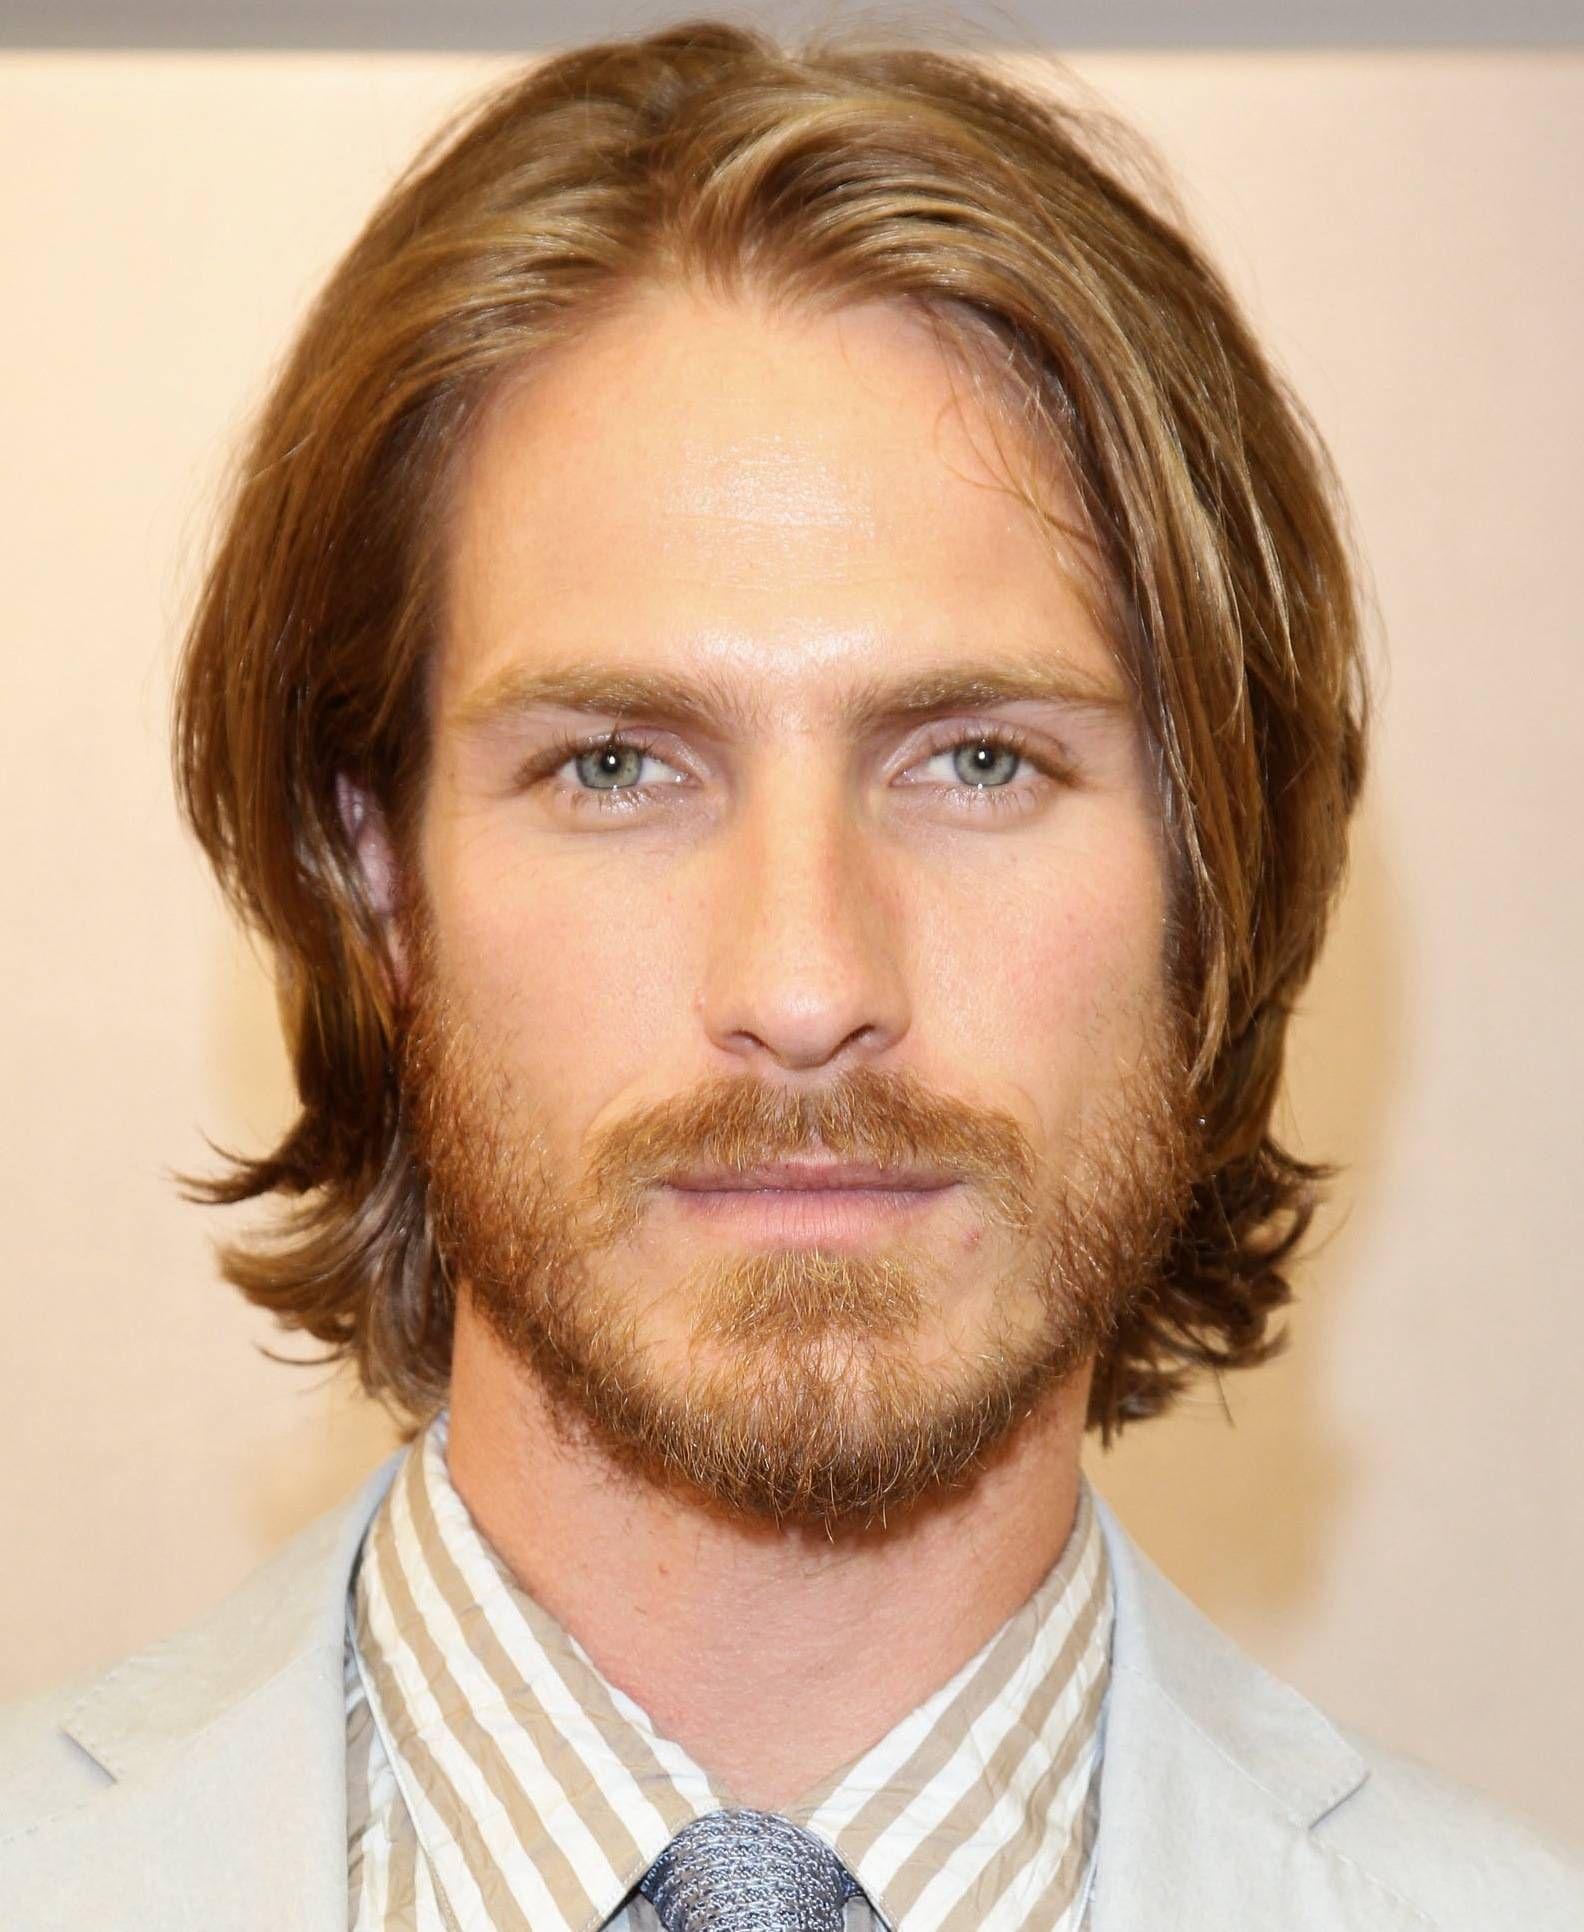 Men Long Hairstyles Long Men's Look  Hair Styles  Pinterest  Haircuts Mens Hair And